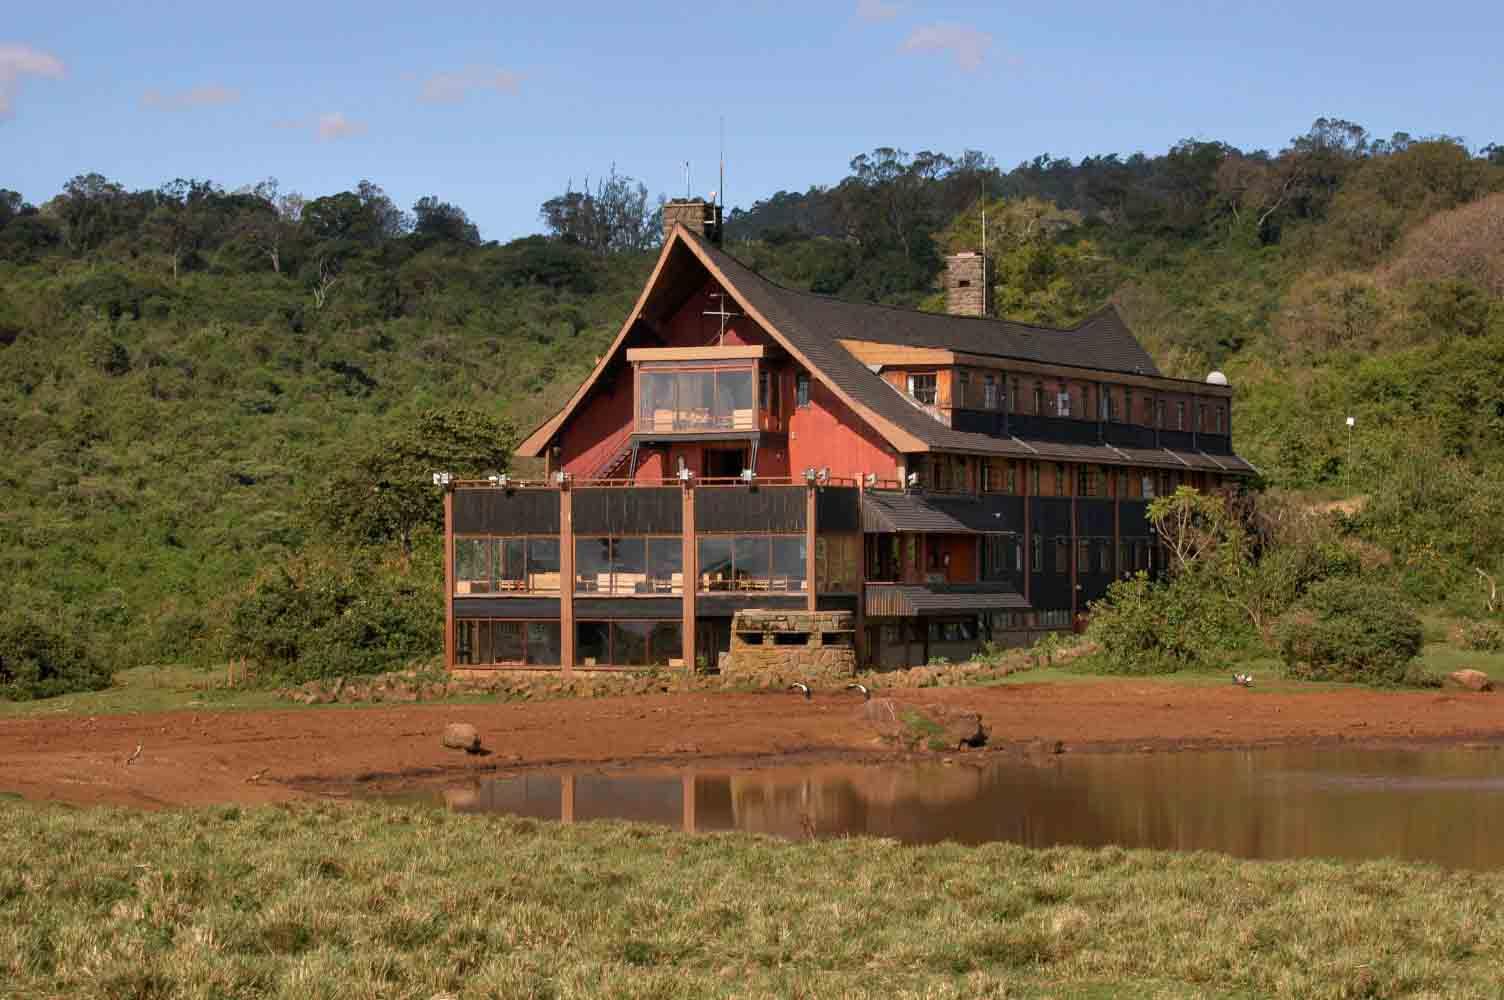 Tour Tp HCM- Nairobi- Vườn Quốc Gia Aberdares- Nakuru- Khu bảo tồn Masai Ma